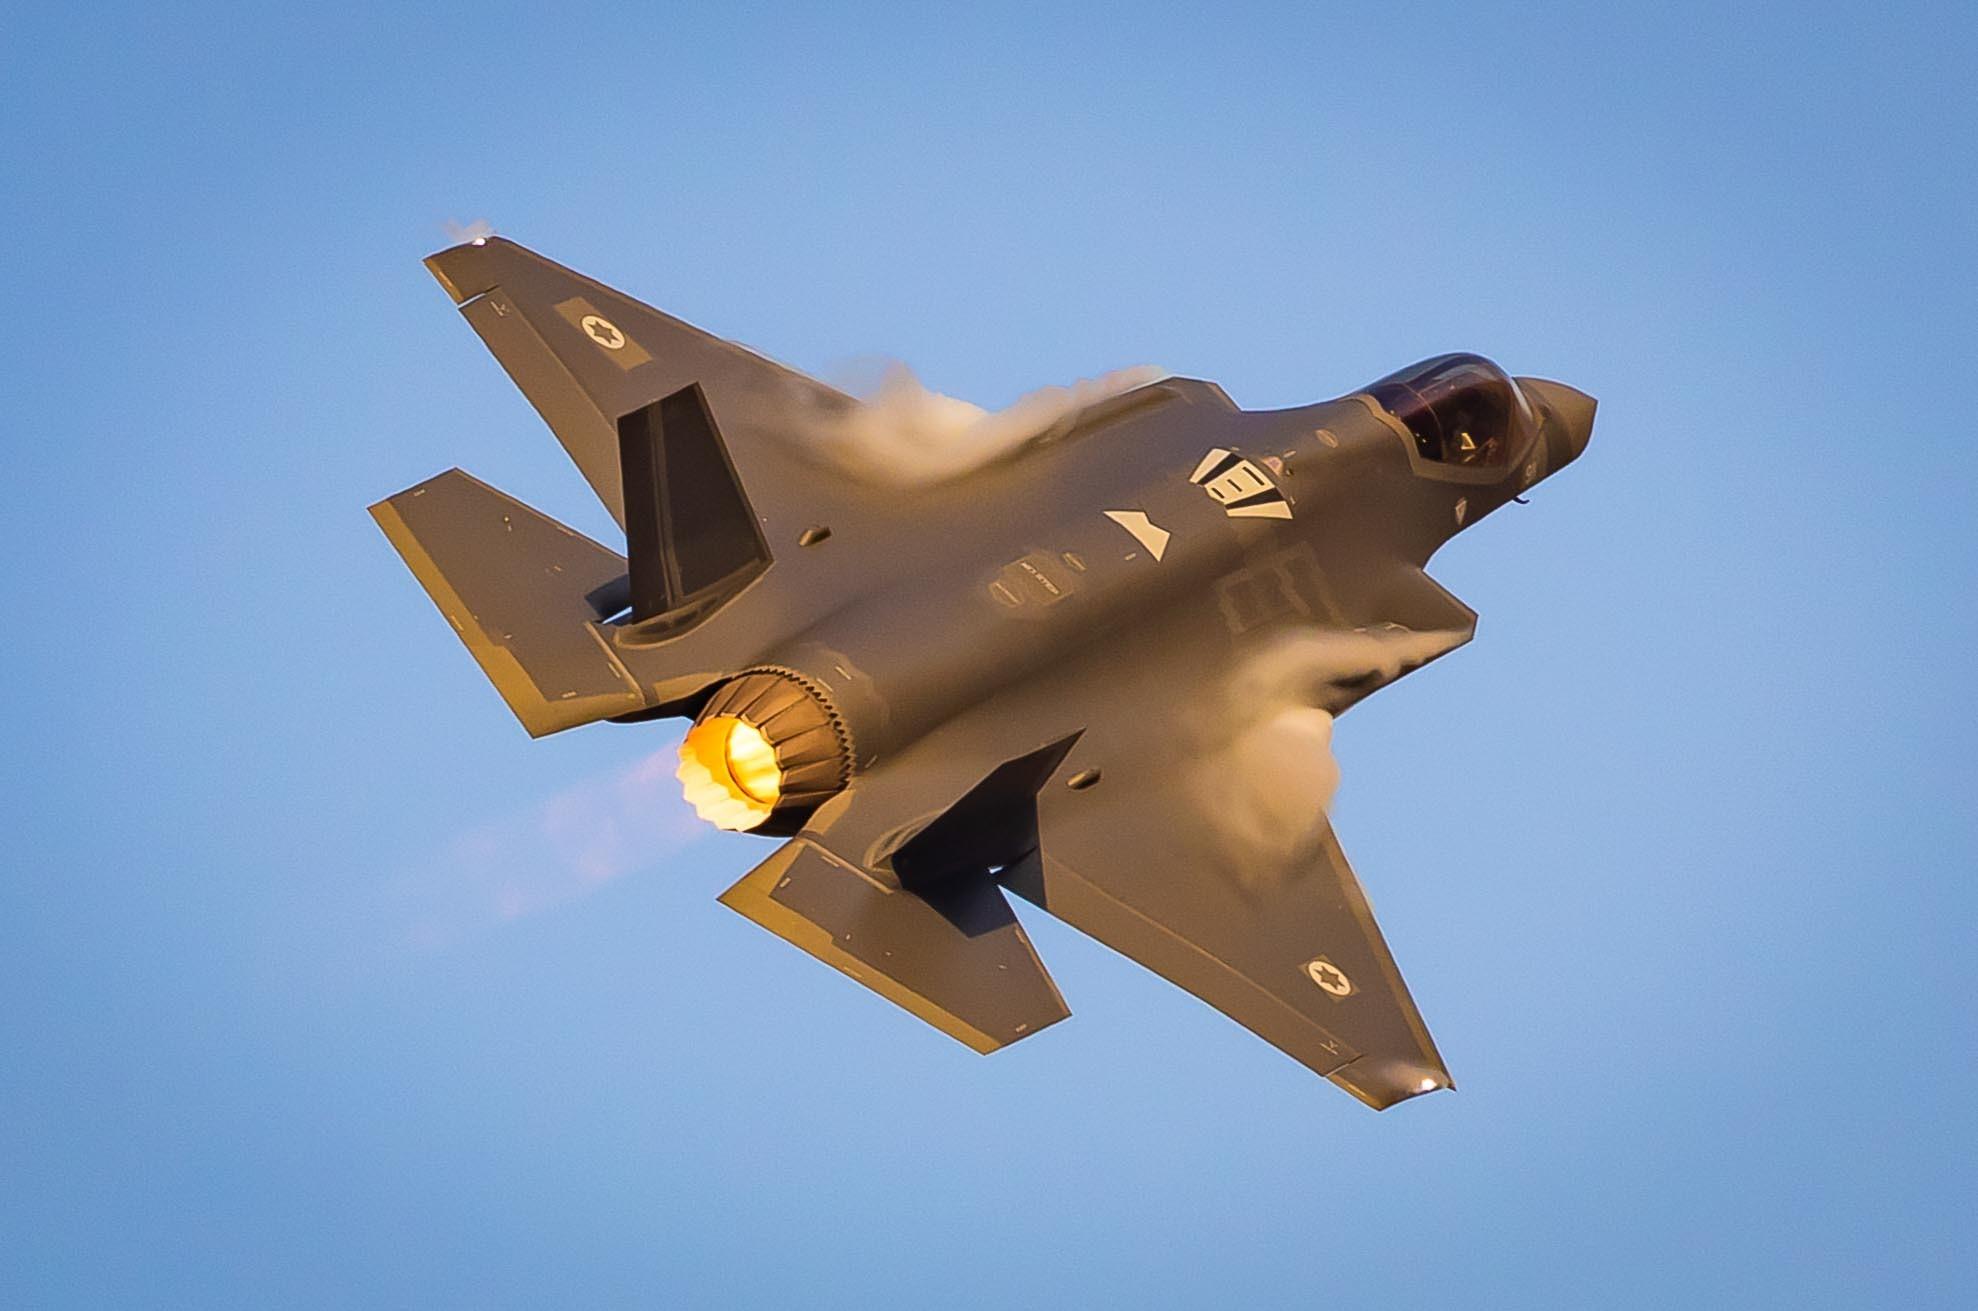 "<p>Фото © Twitter / <a href=""https://twitter.com/IAFsite/status/1166721094658560001/photo/1"" target=""_self"">Israeli Air Forces</a></p>"